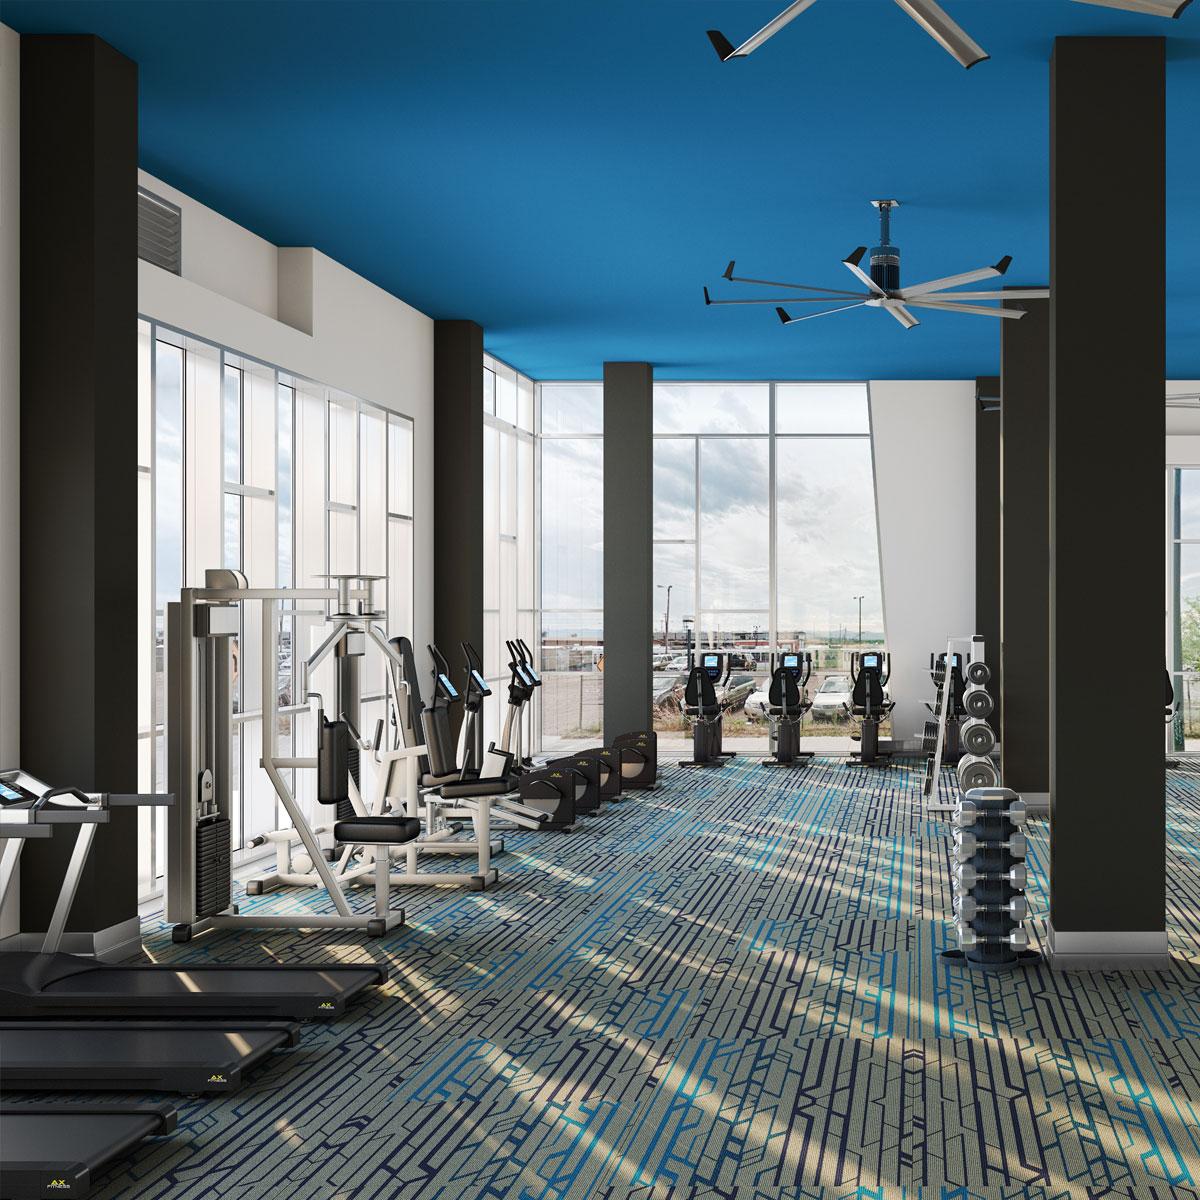 Movement Gym